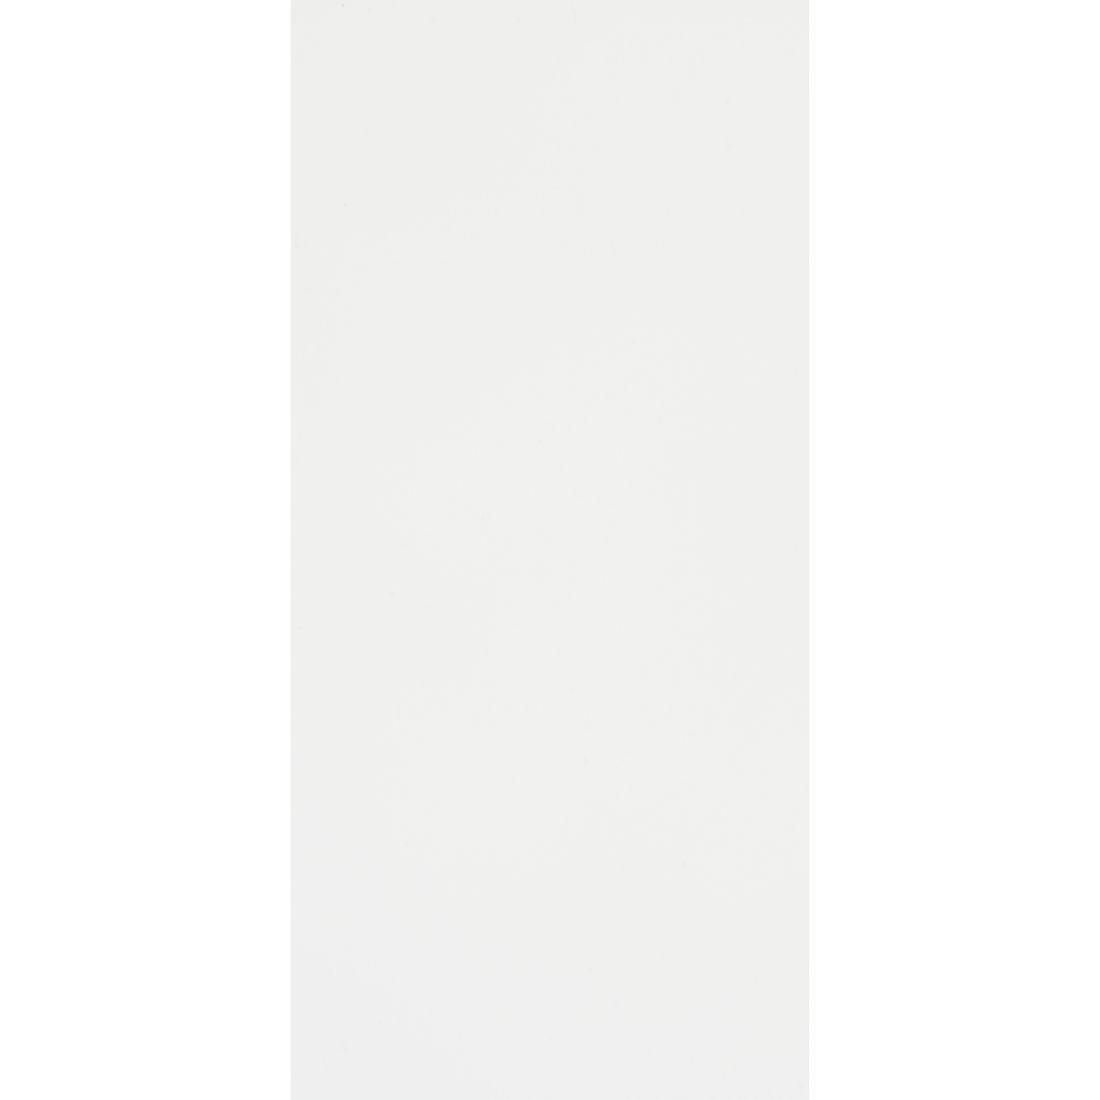 Aqua Wall Lining Panel Polar White Gloss 2700 x 1200 x 4.5mm